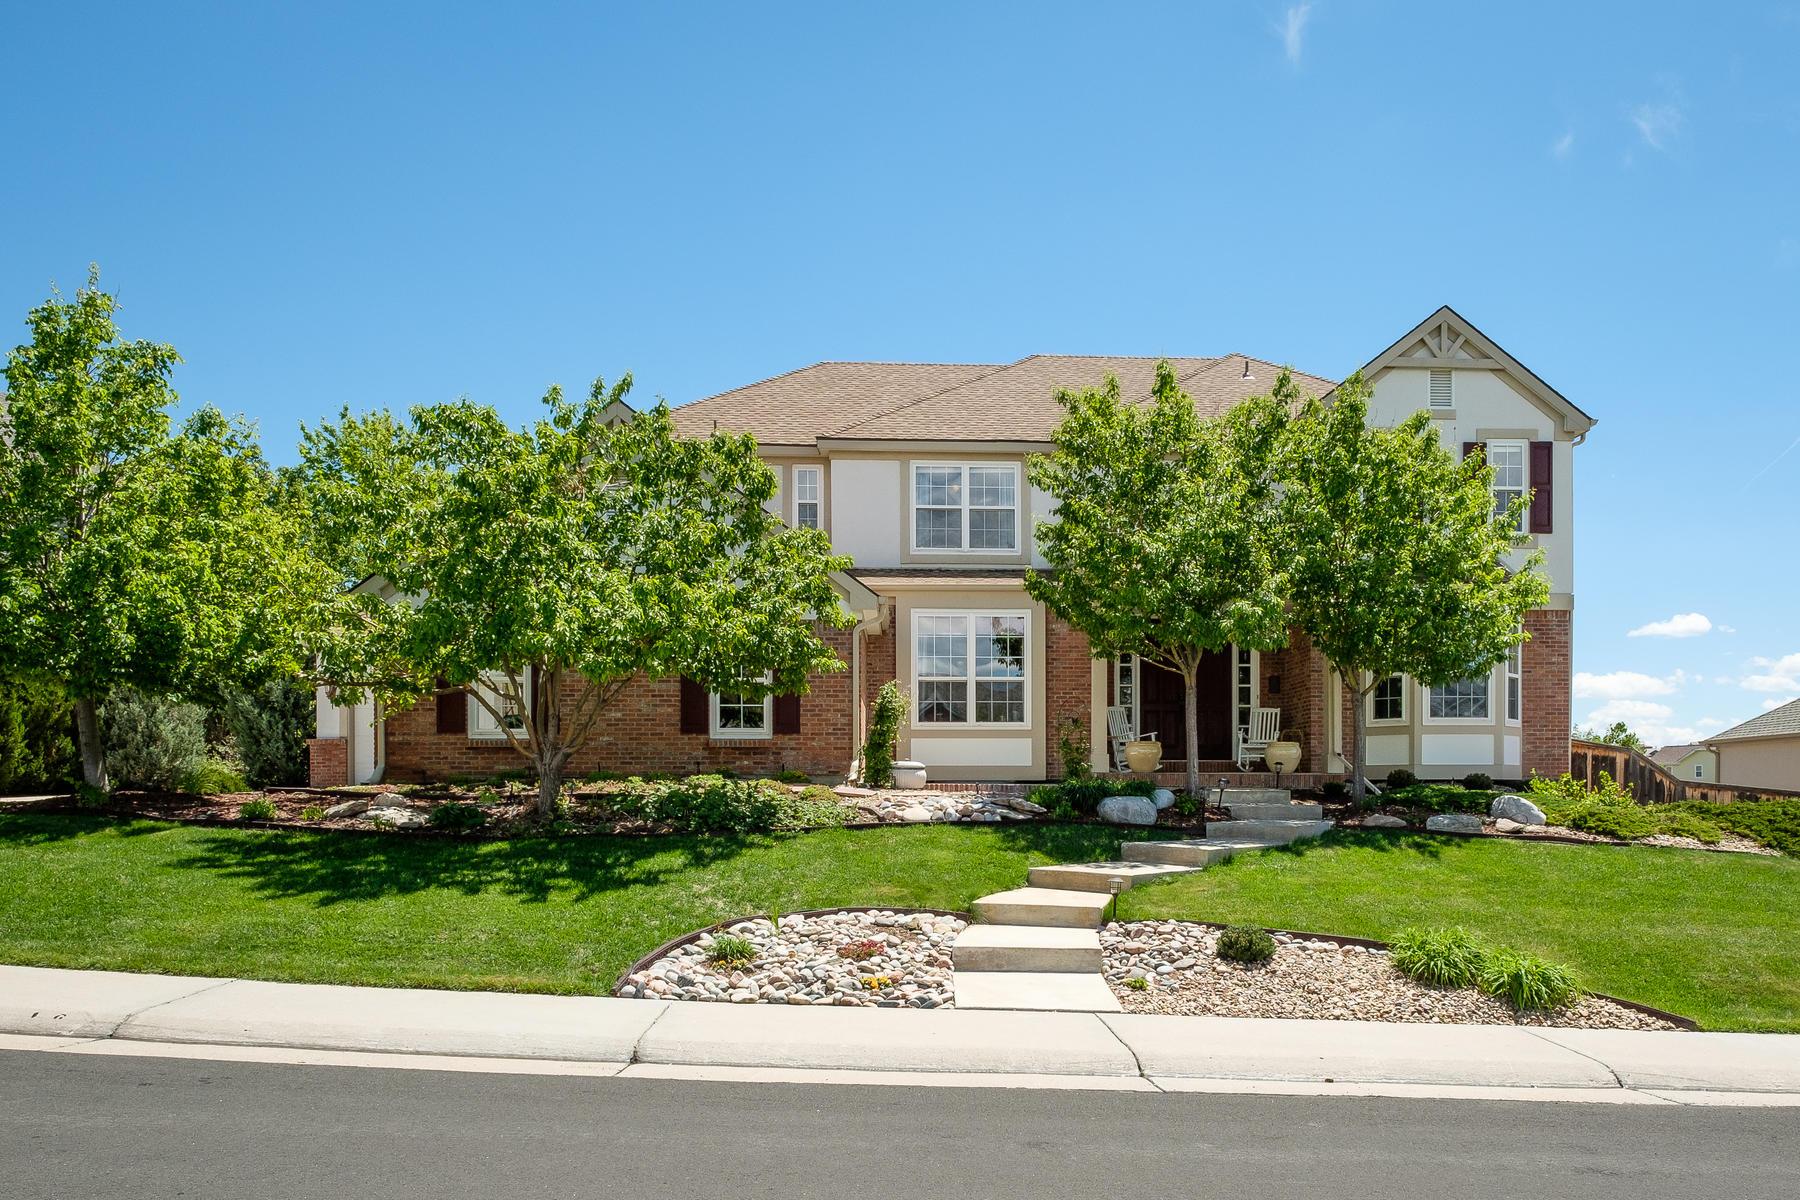 Single Family Home for Sale at A unique cul-de-sac lot 10329 Brookhollow Cir Highlands Ranch, Colorado, 80129 United States